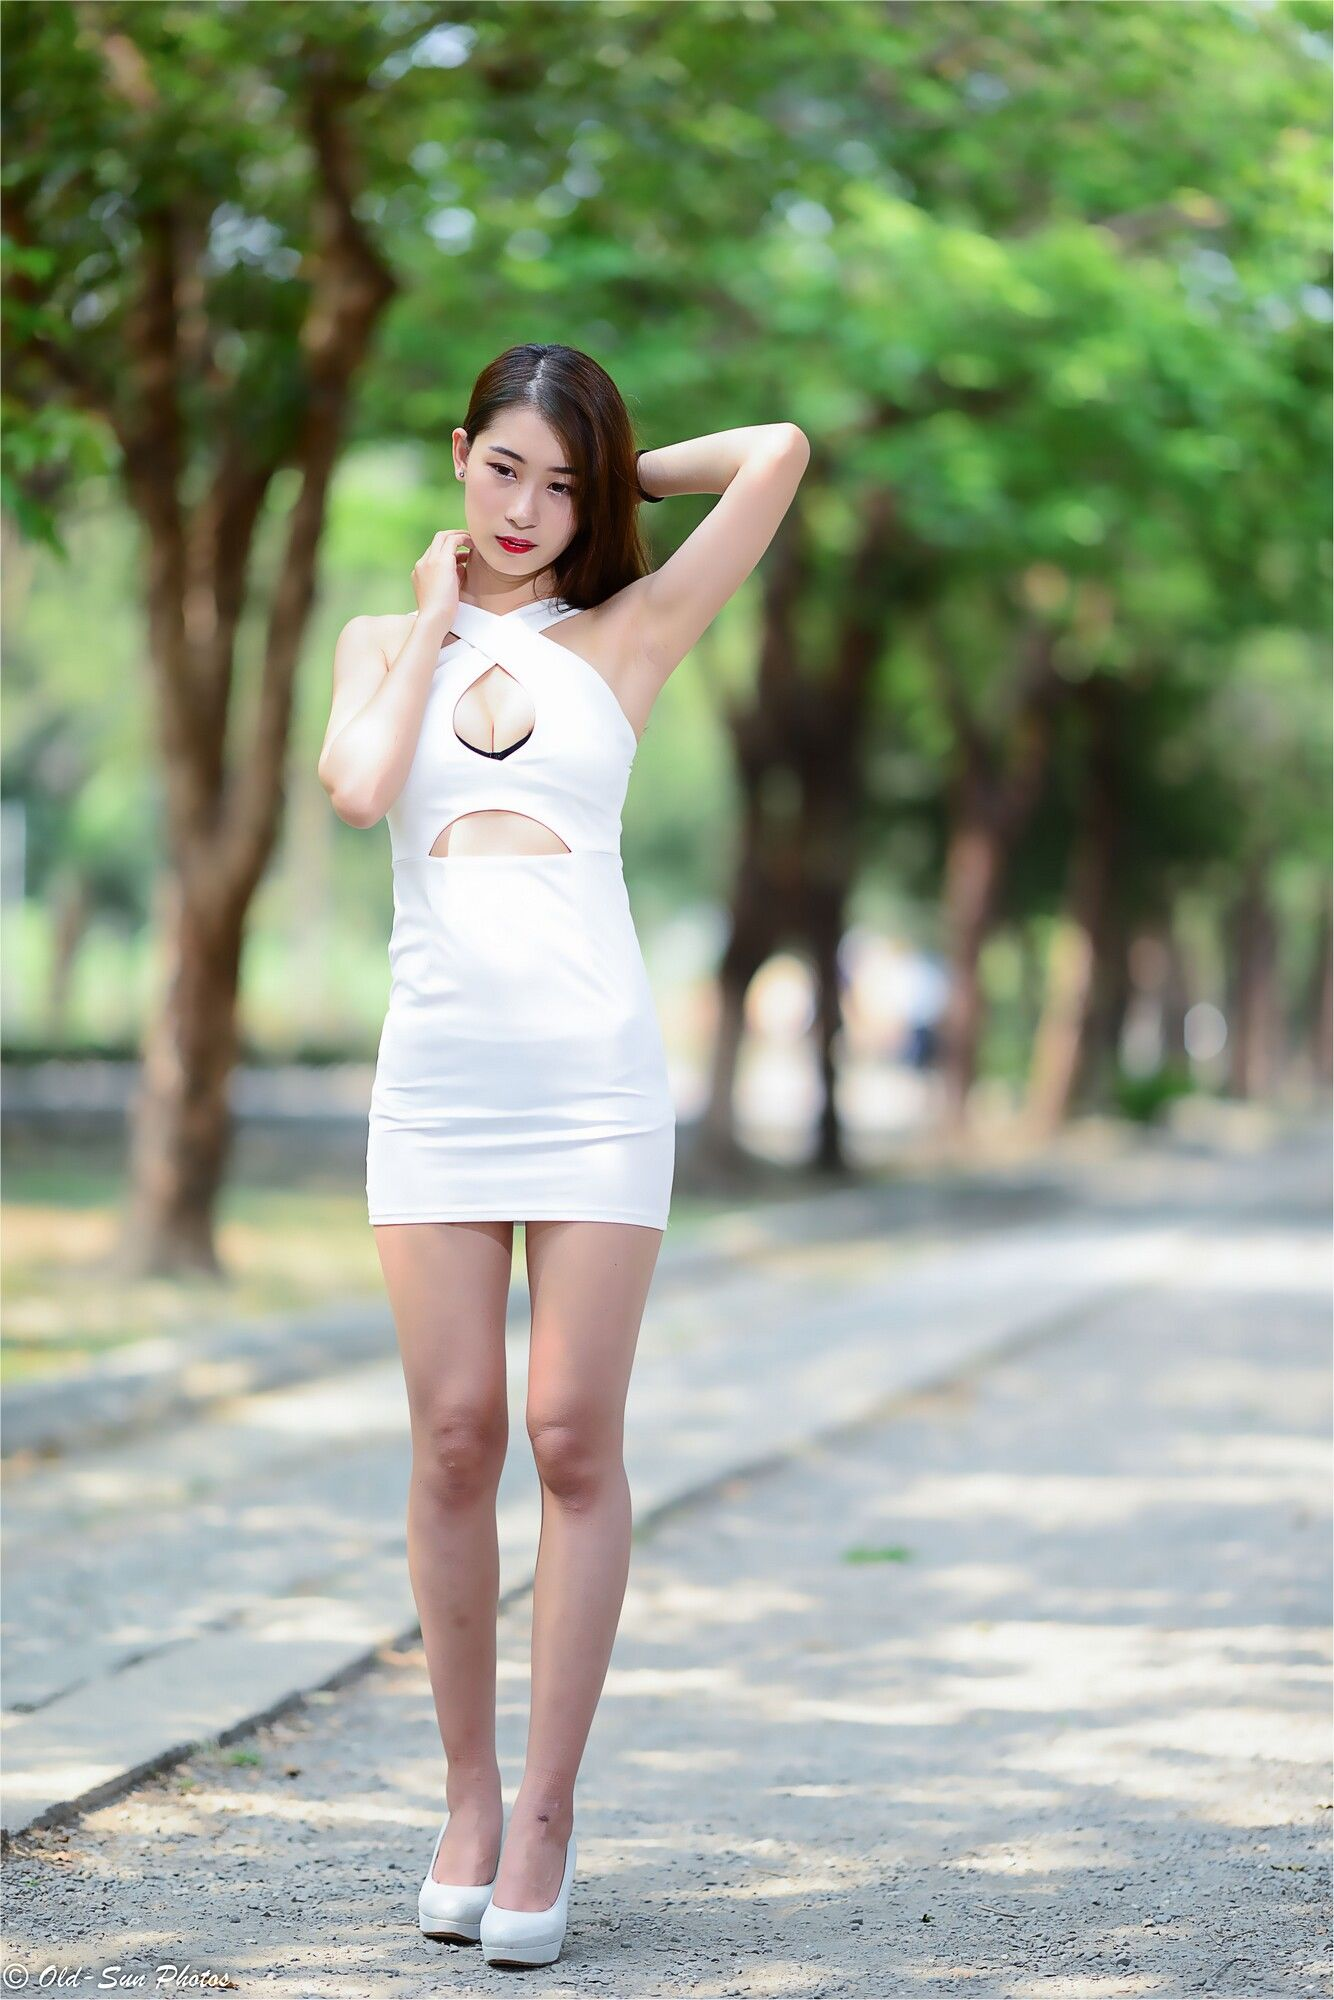 VOL.9 [台湾正妹]气质御姐高贵包臀裙美女:小雨超高清个人性感漂亮大图(92P)